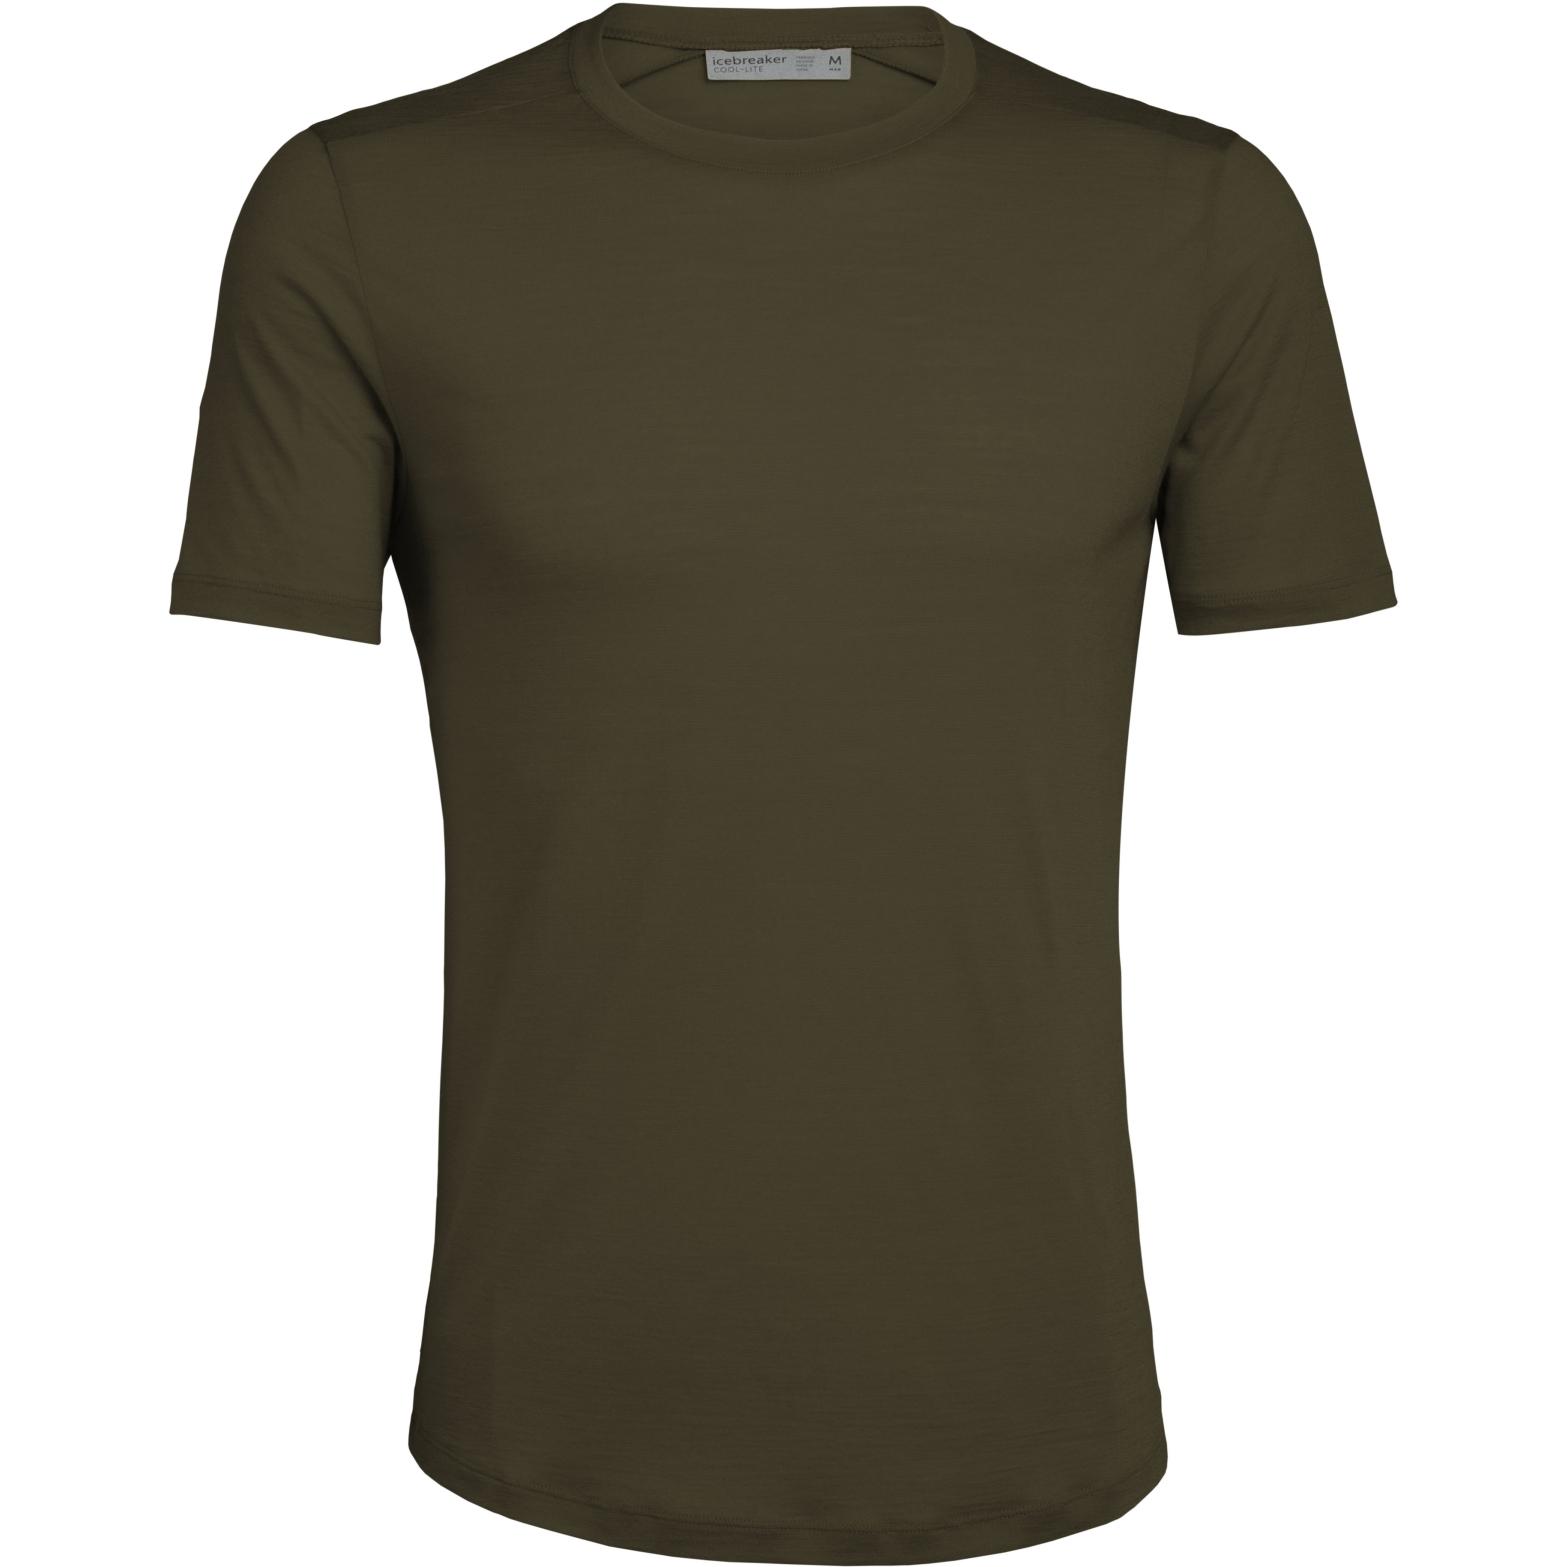 Produktbild von Icebreaker Sphere Crewe Herren T-Shirt - Loden